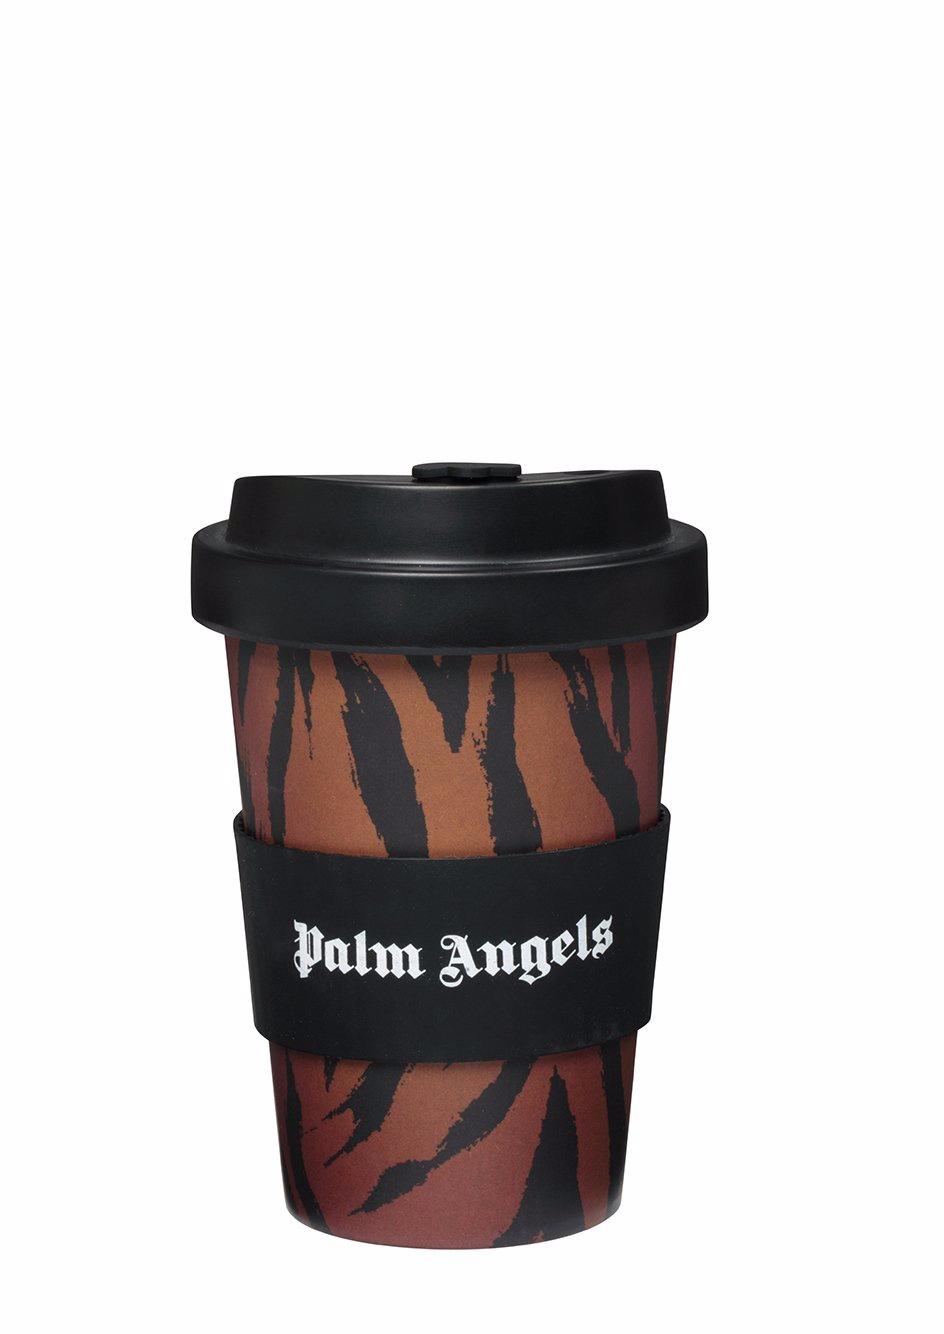 Palm-Angels-Coffee